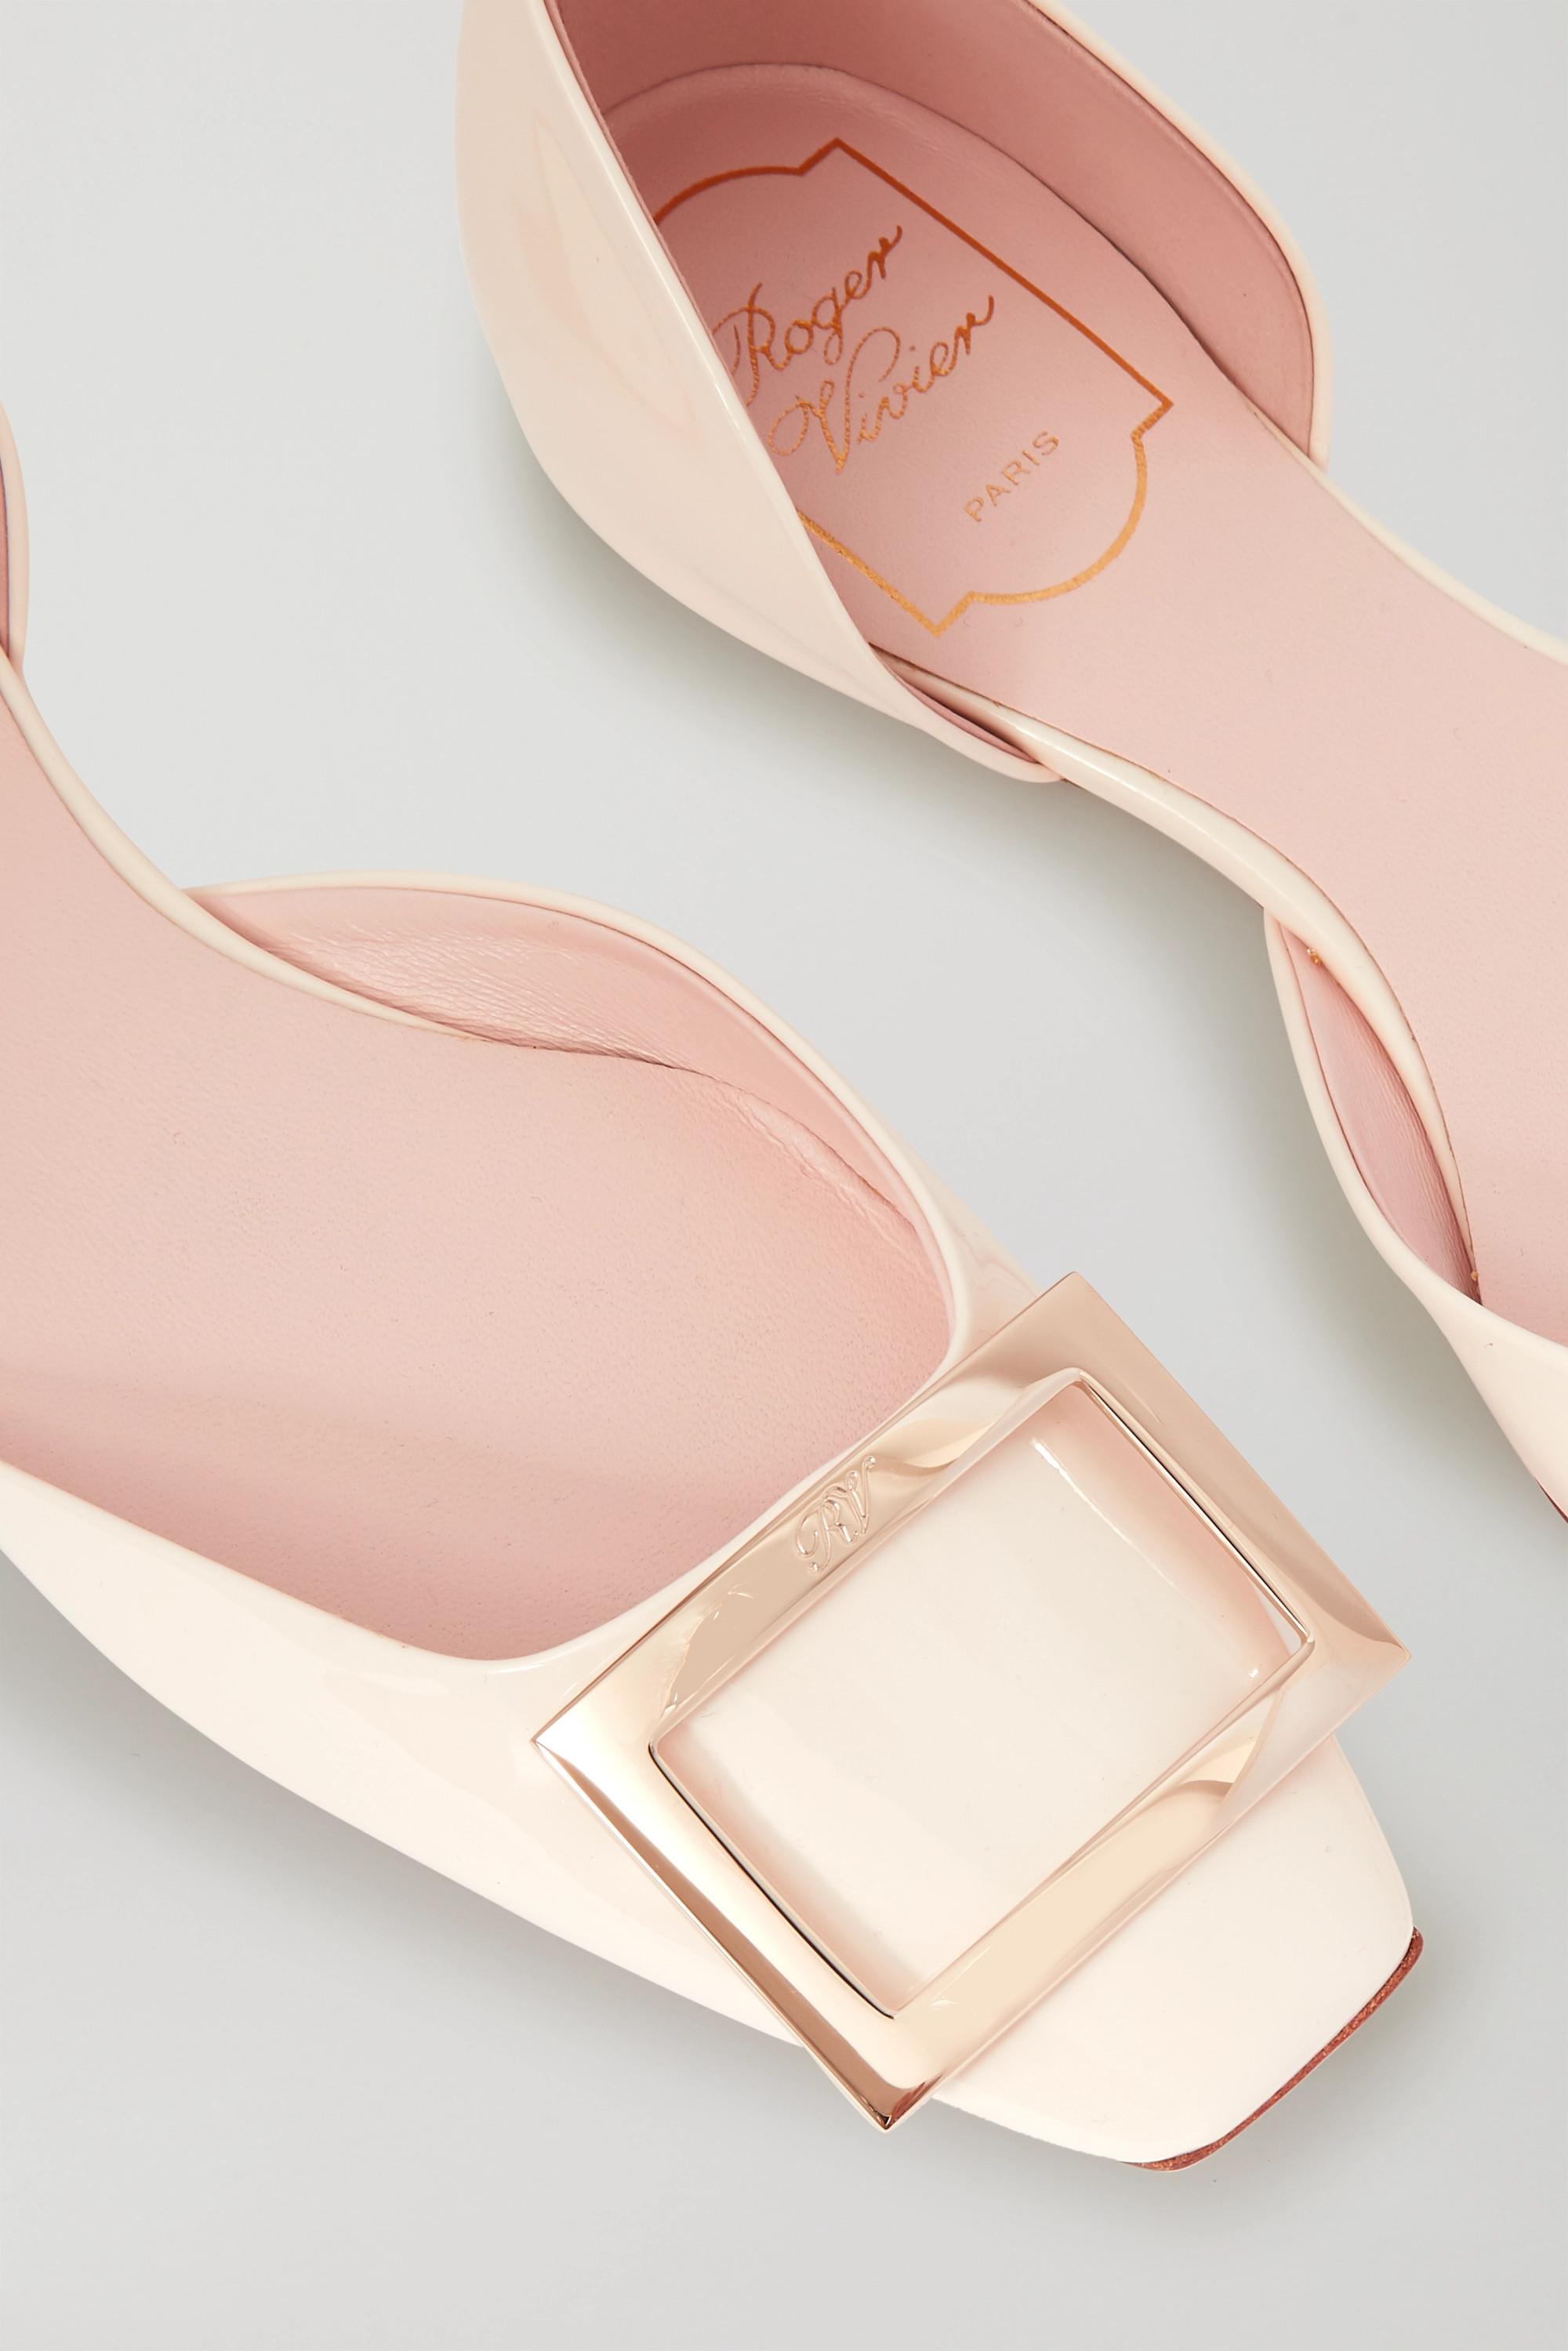 Roger Vivier Trompette D'Orsay leather ballet flats